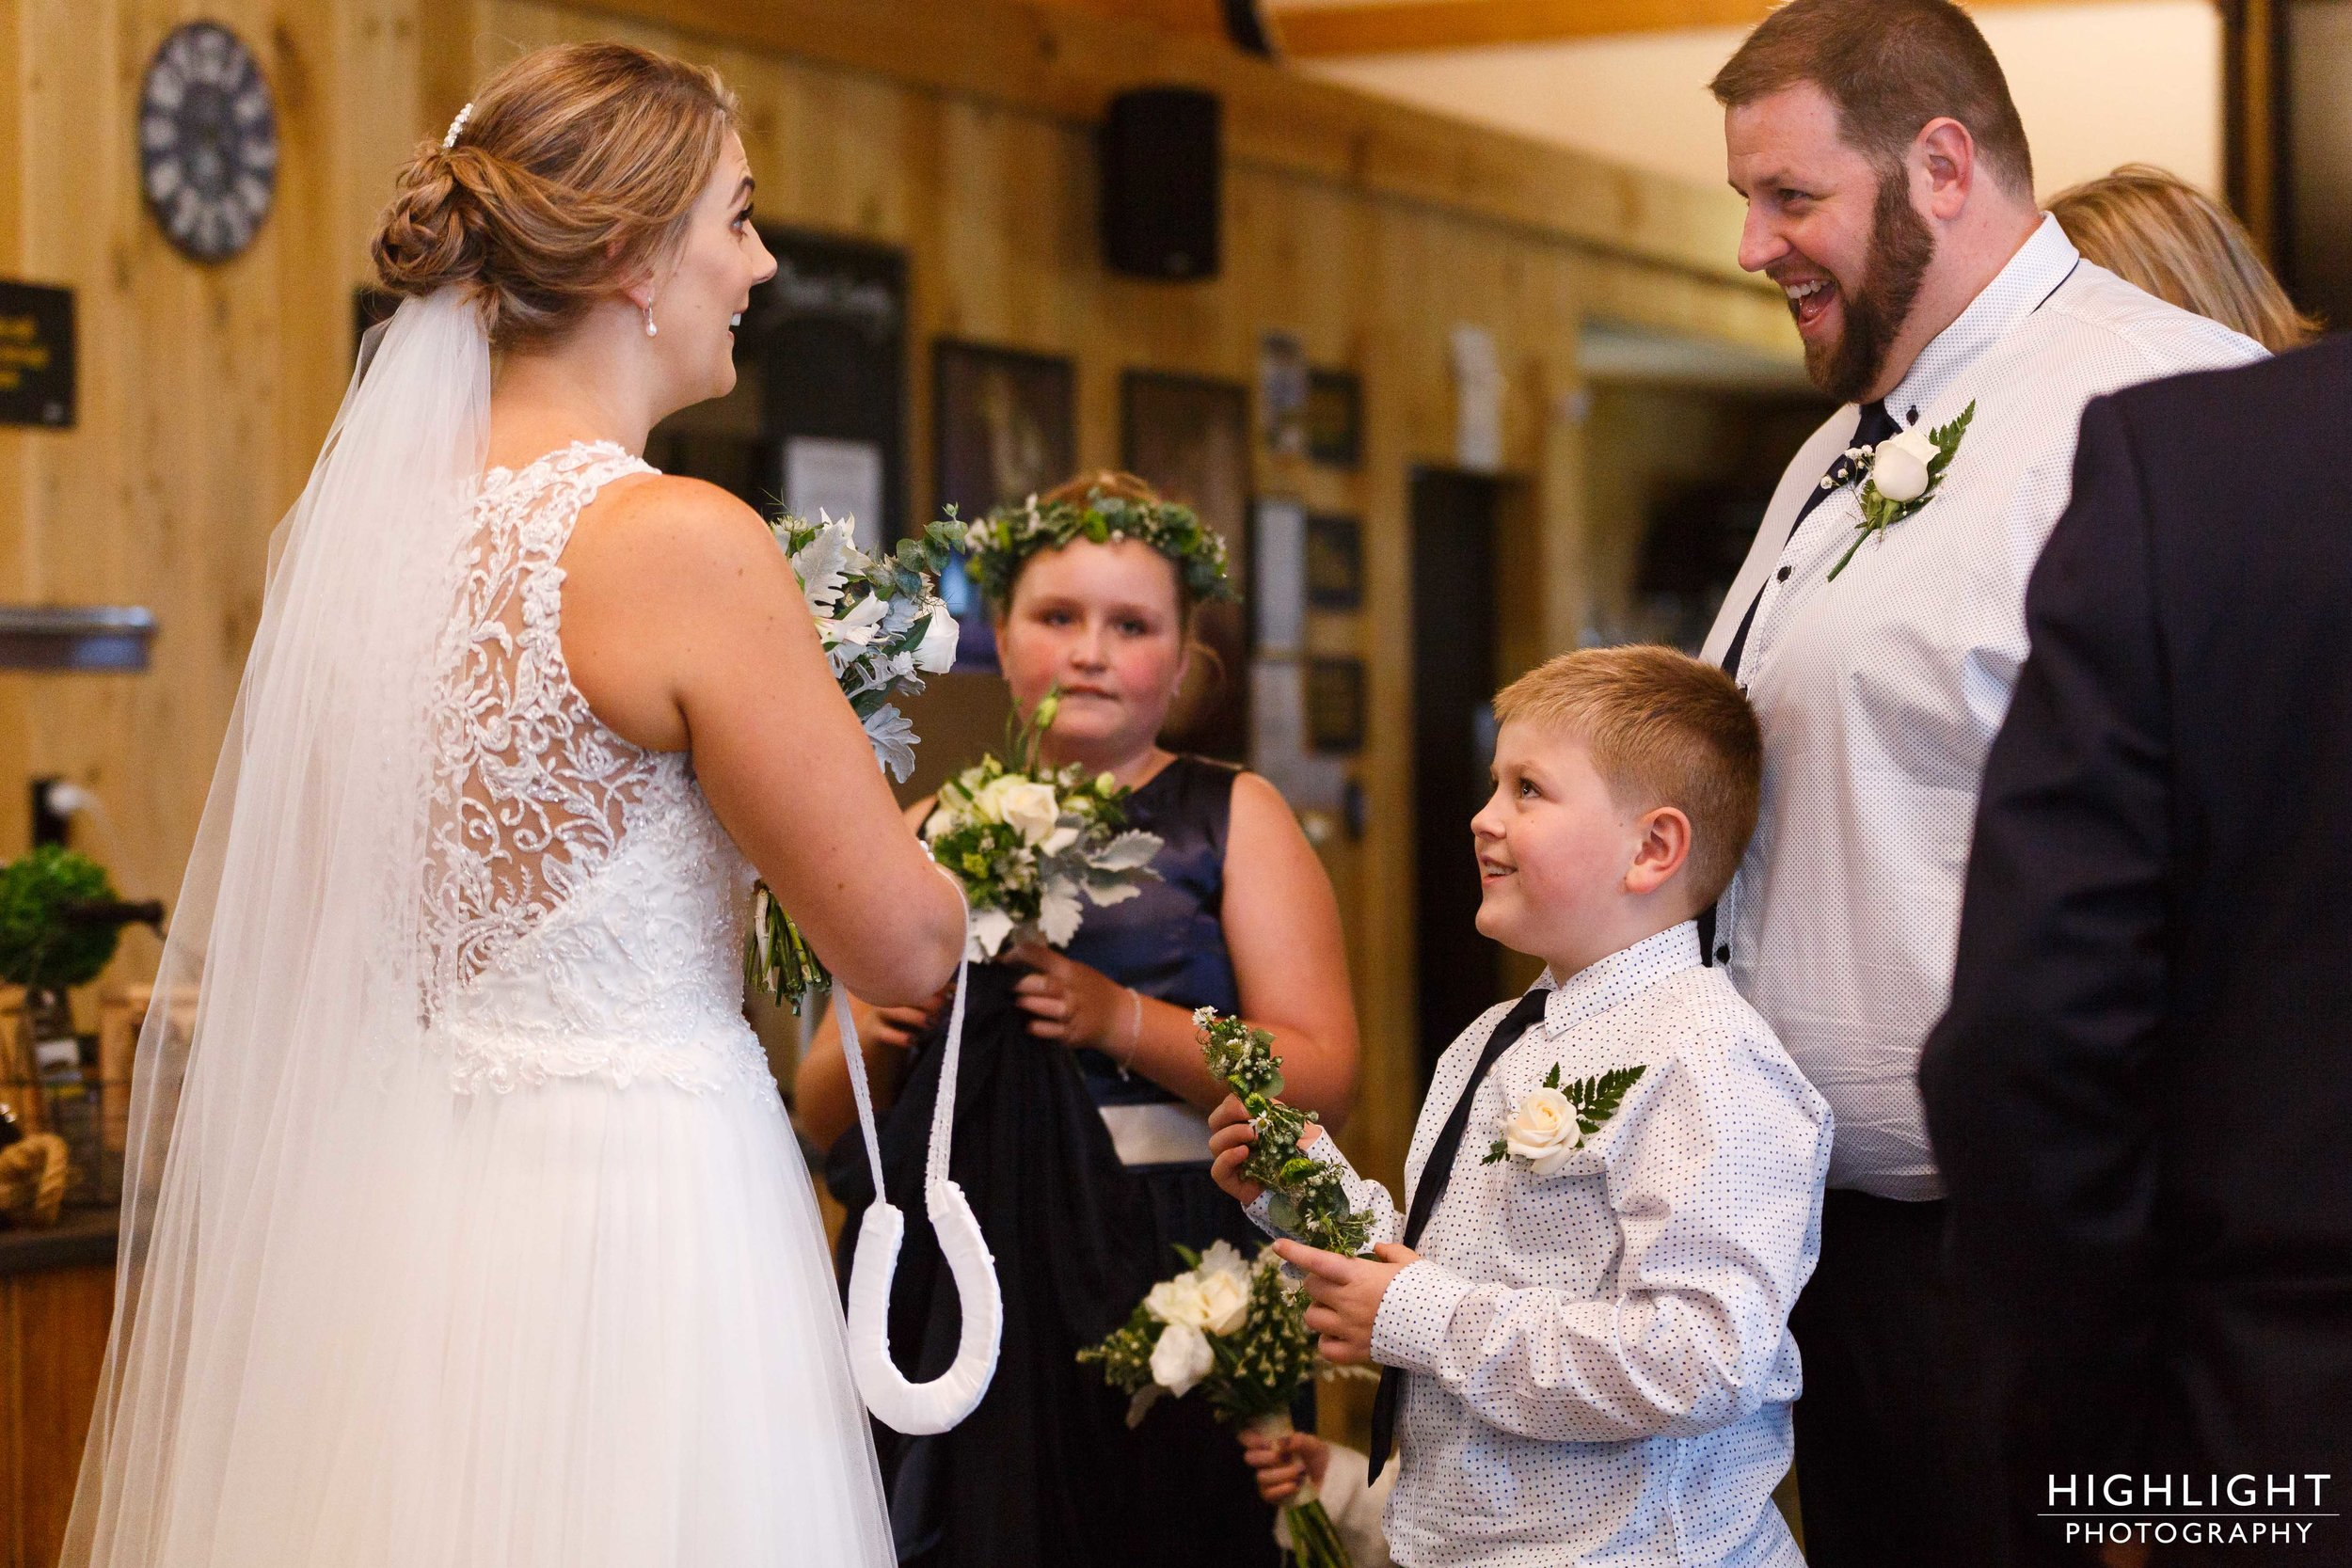 highlight-wedding-photography-palmerston-north-new-zealand-orlando-country-club-wedding-99.jpg